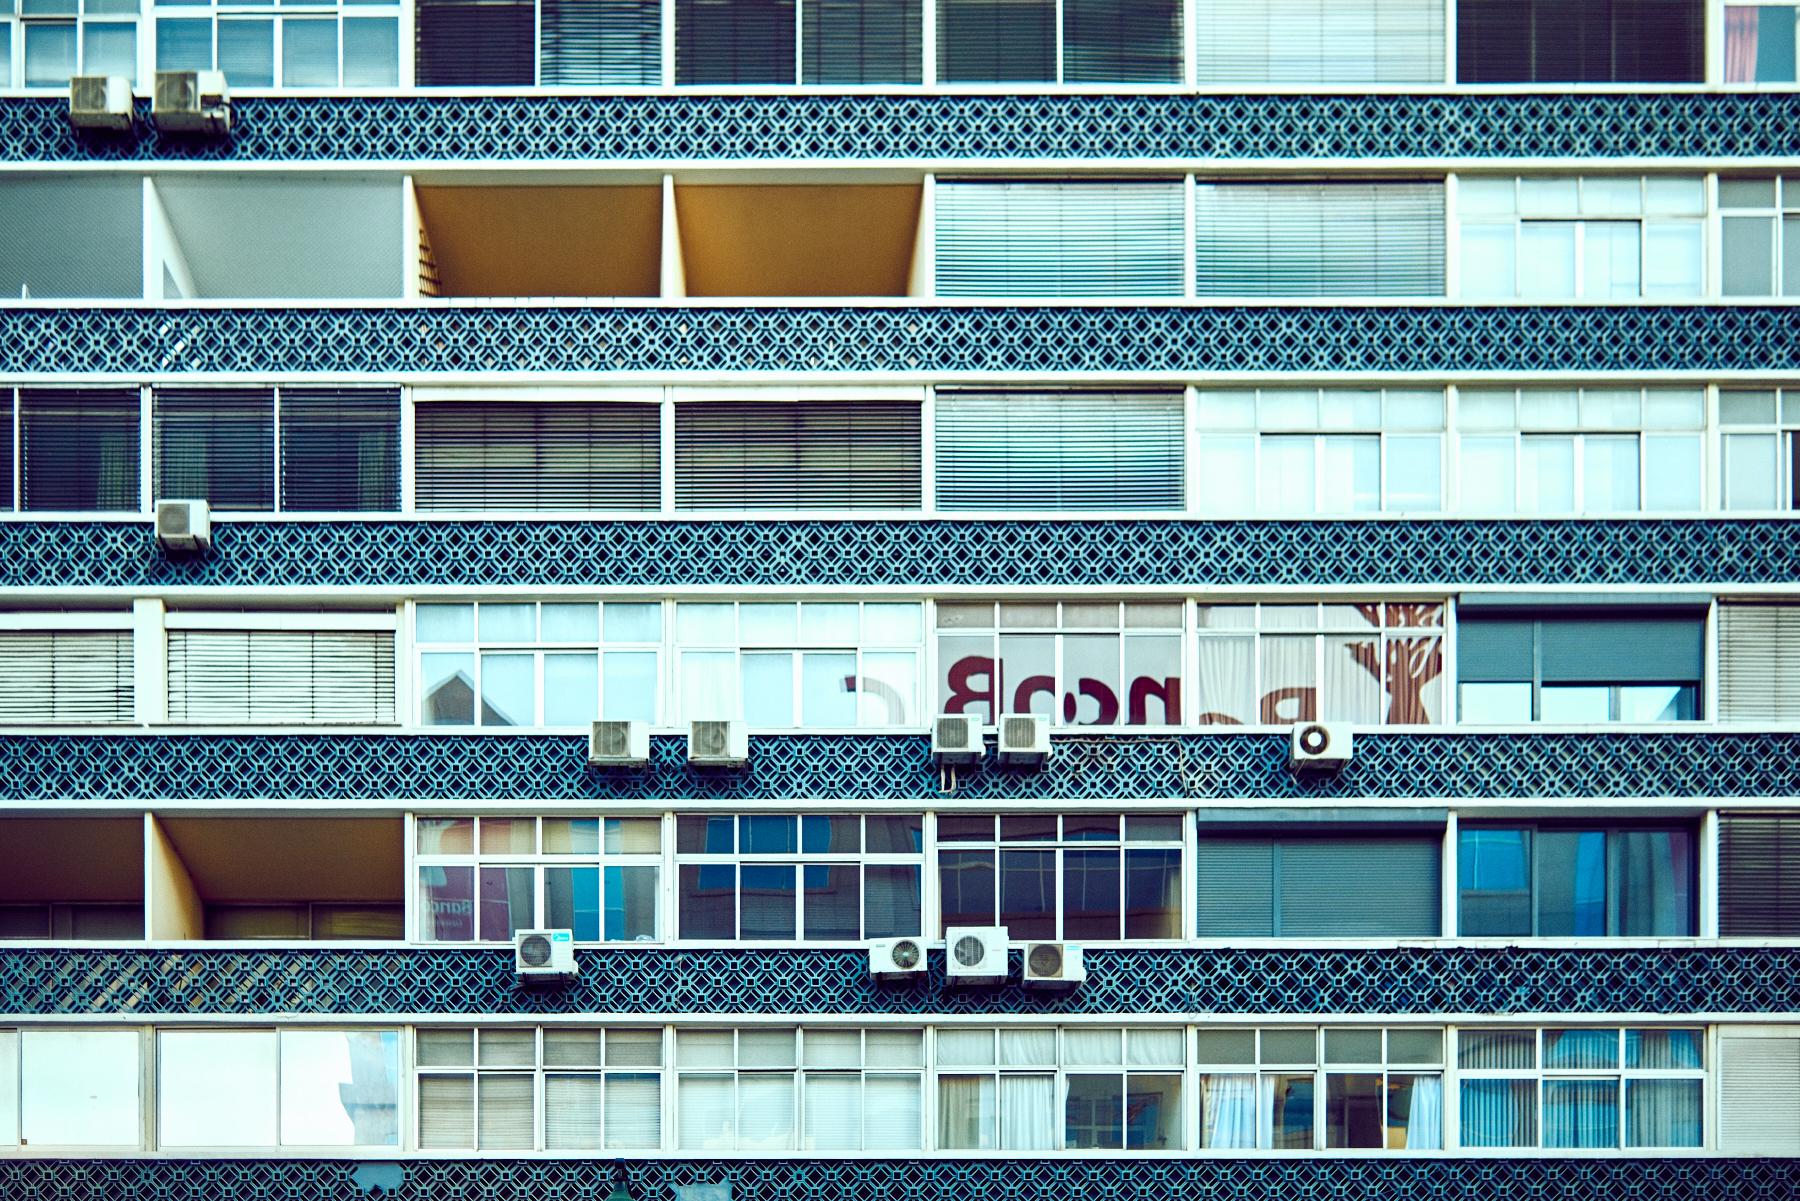 Fotoperiodismo - Liboa